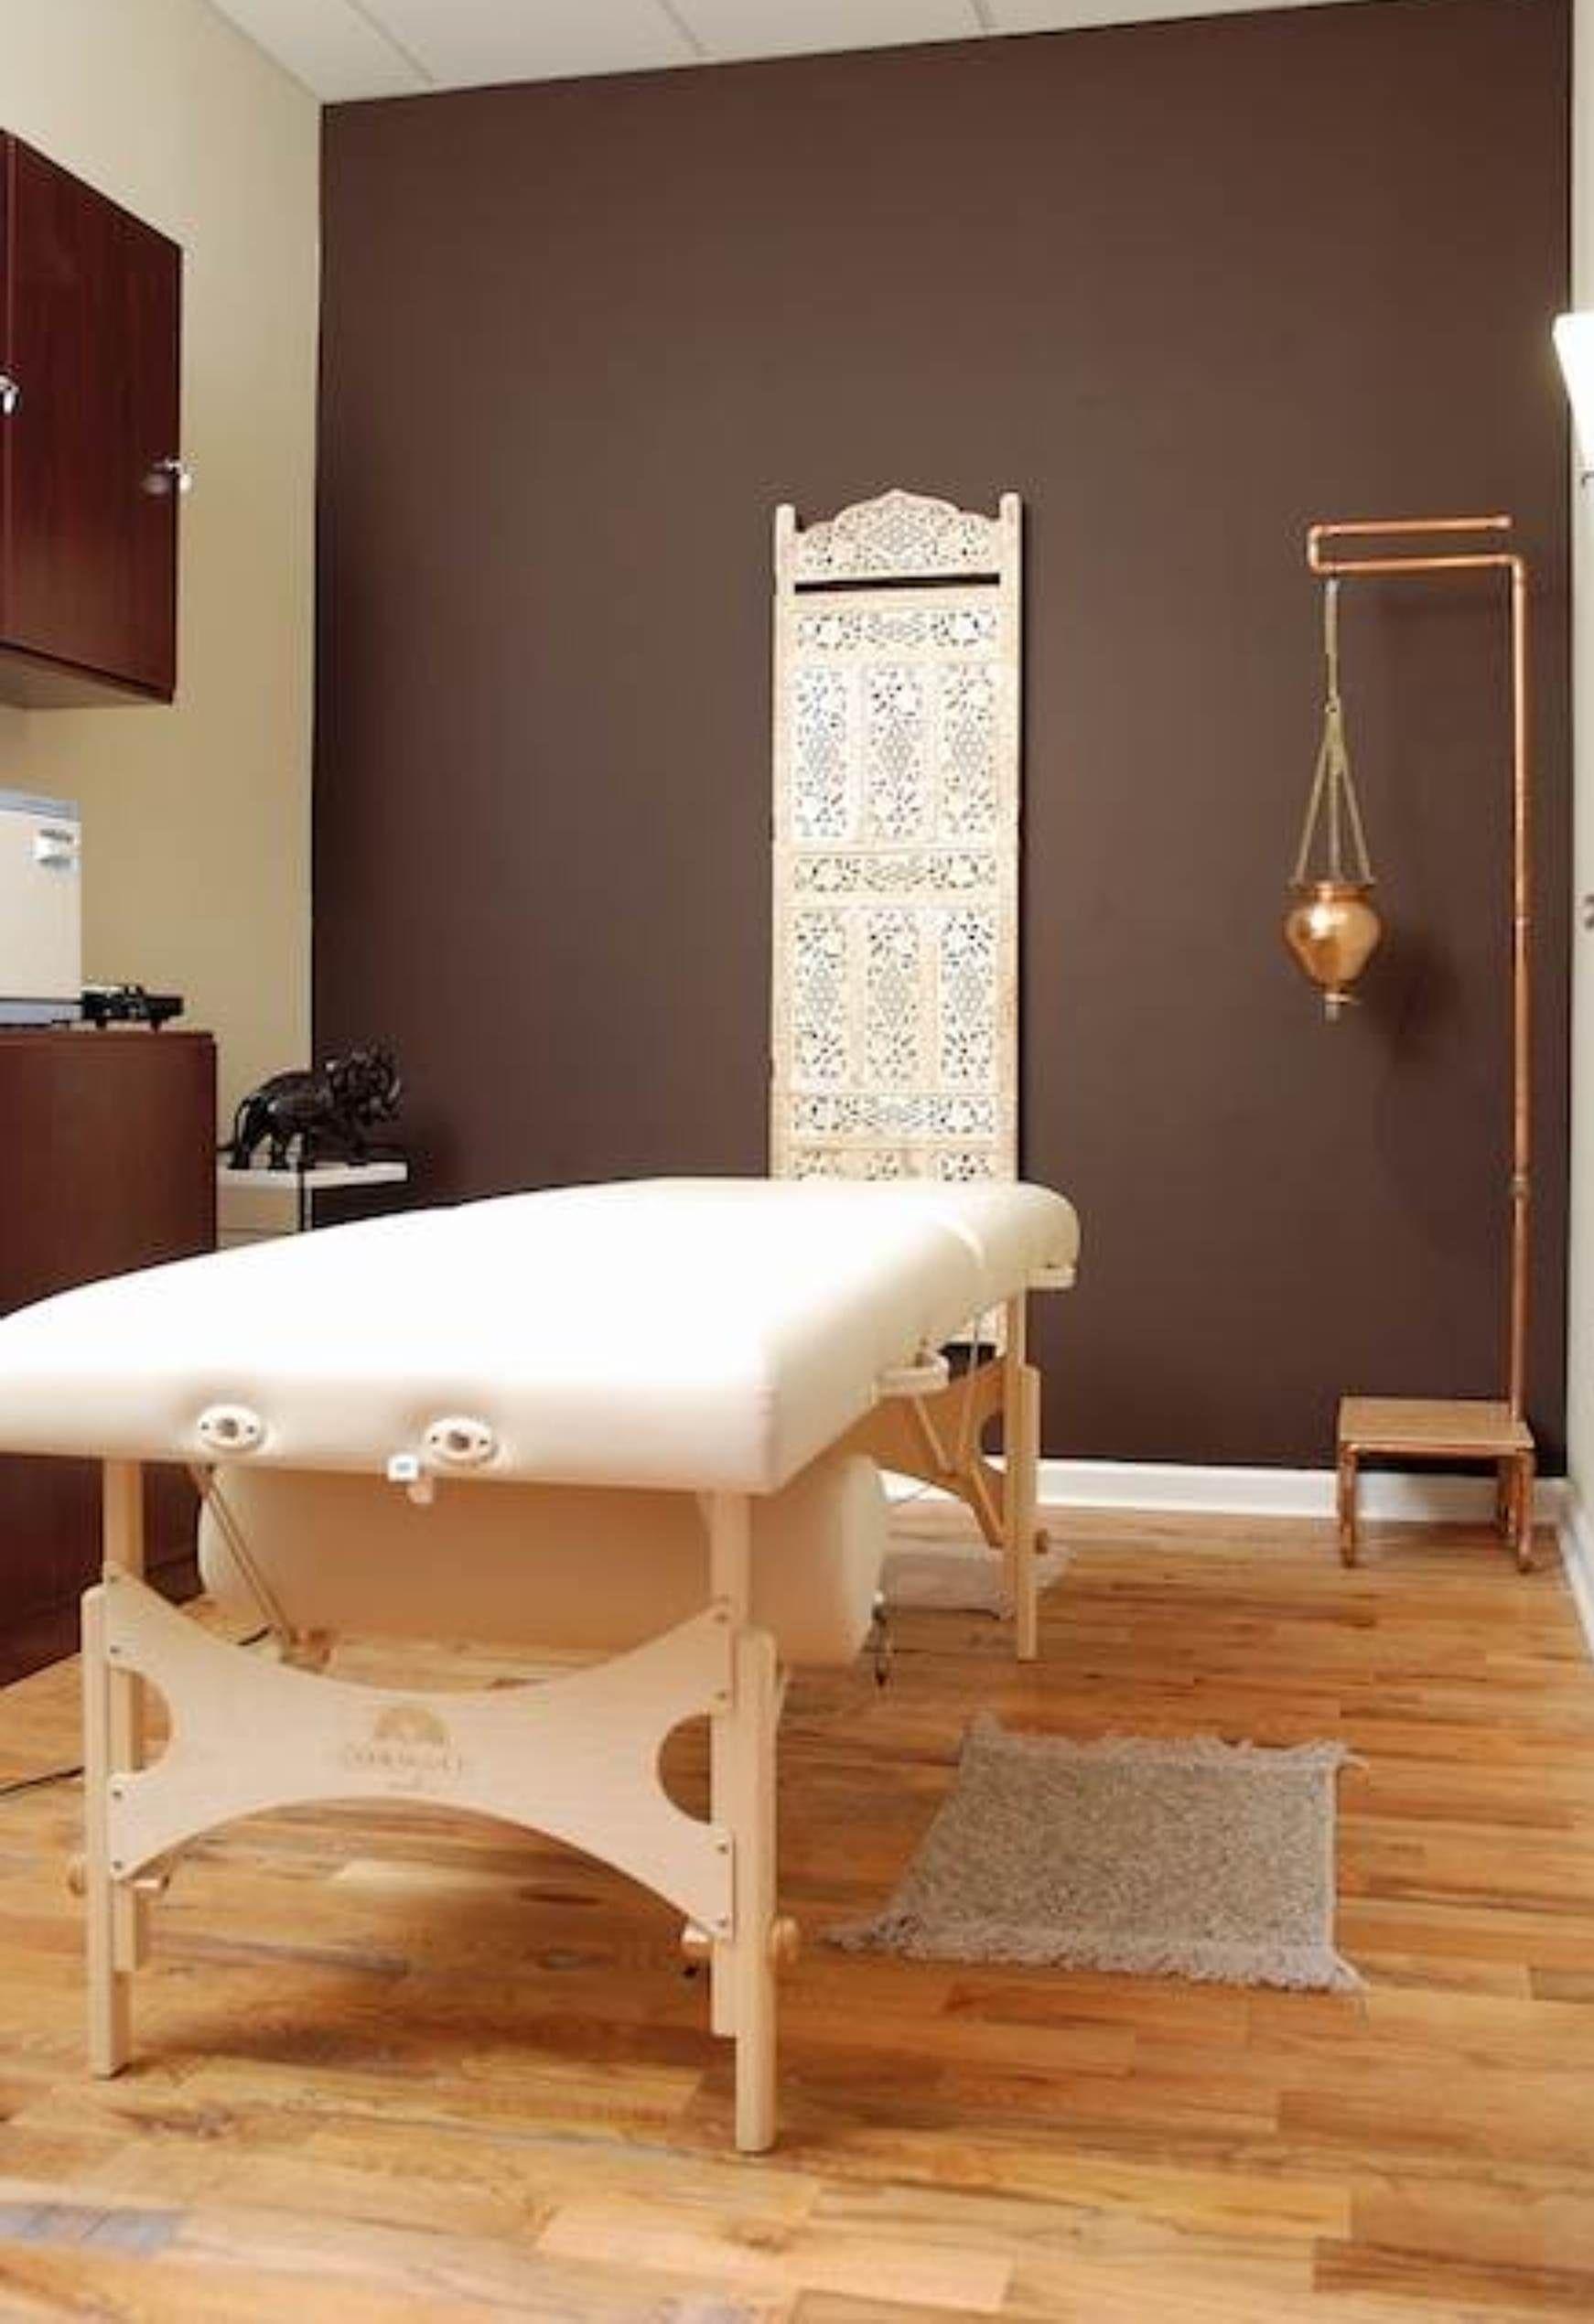 Massage Room Design Ideas Part - 42: Small Massage Room Ideas | Previous Image Next Image